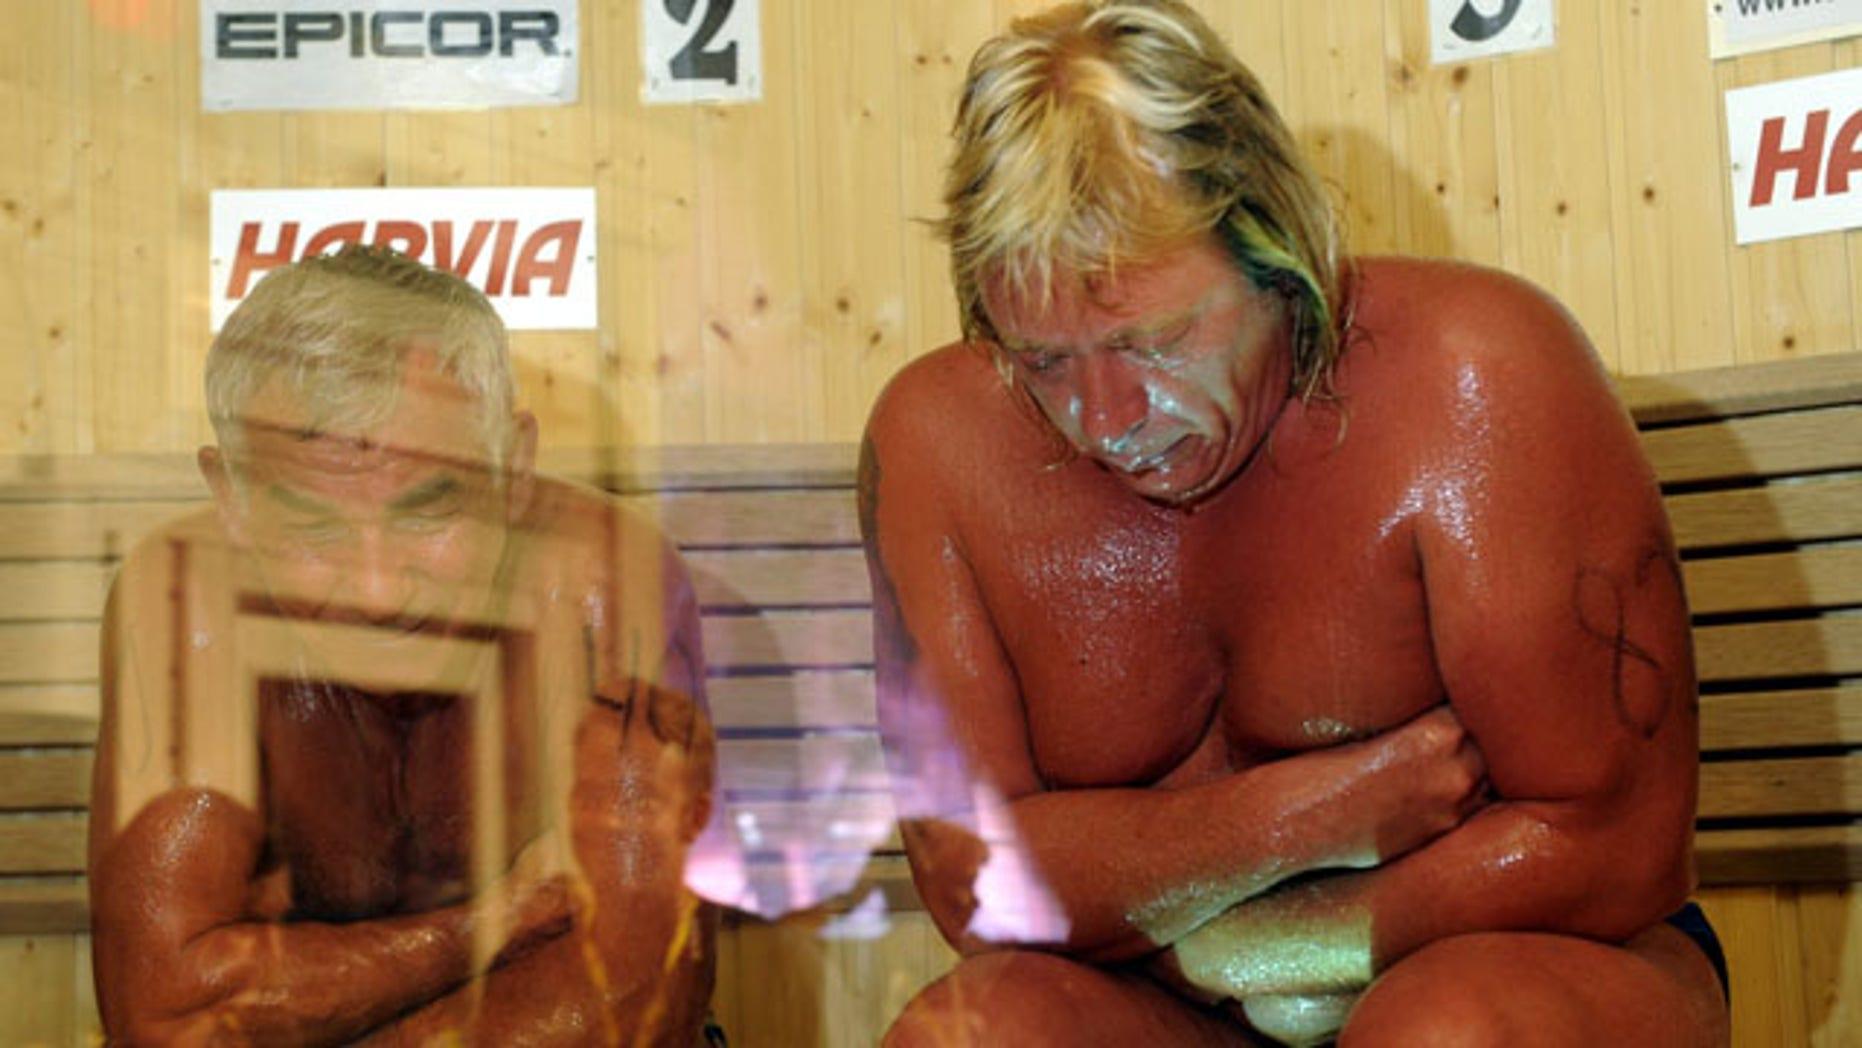 Aug. 7: Russia's Vladimir Ladyzhenskiy, left, and Finland's Timo Kaukonen seen during the World Sauna Championships in Heinola, Finland.